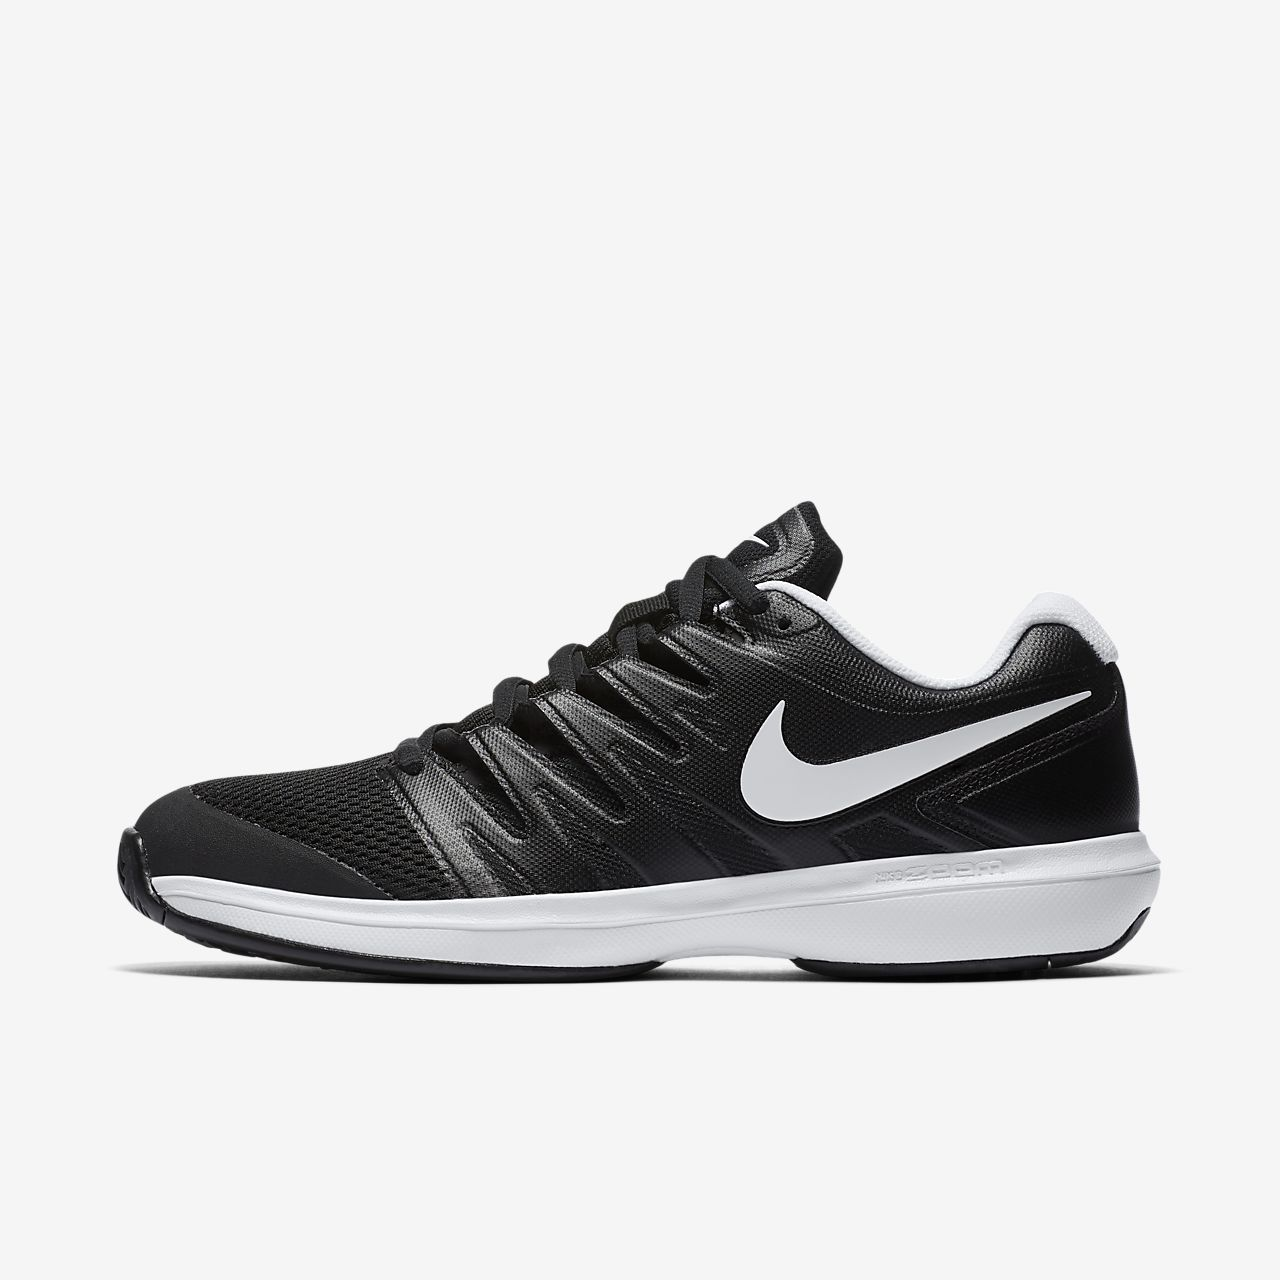 new product cf01d 5f407 NikeCourt Air Zoom Prestige-hardcourt-tennissko til mænd. Nike.com DK